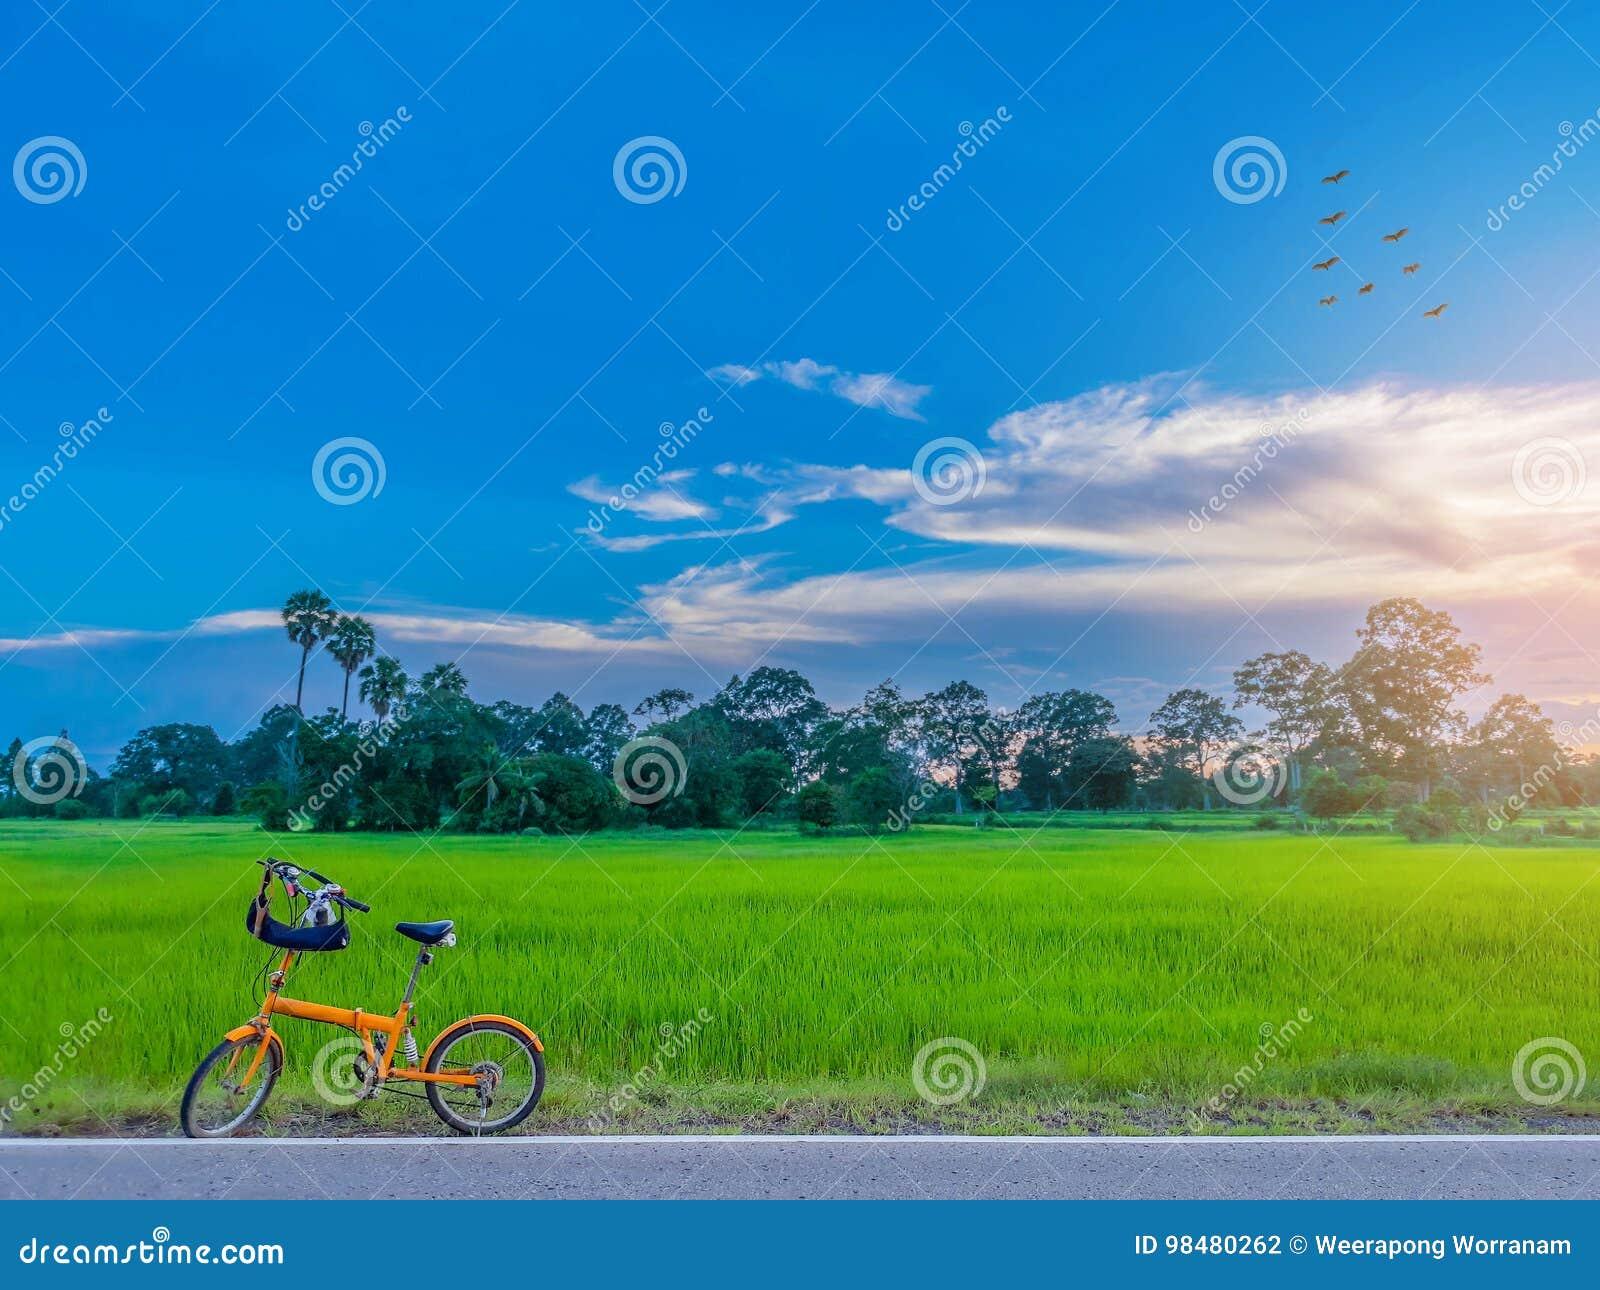 Foco borrado e macio do delicado abstrato a silhueta do campo do arroz  paddy  com a bicicleta, o por do sol, o céu bonito e a nu